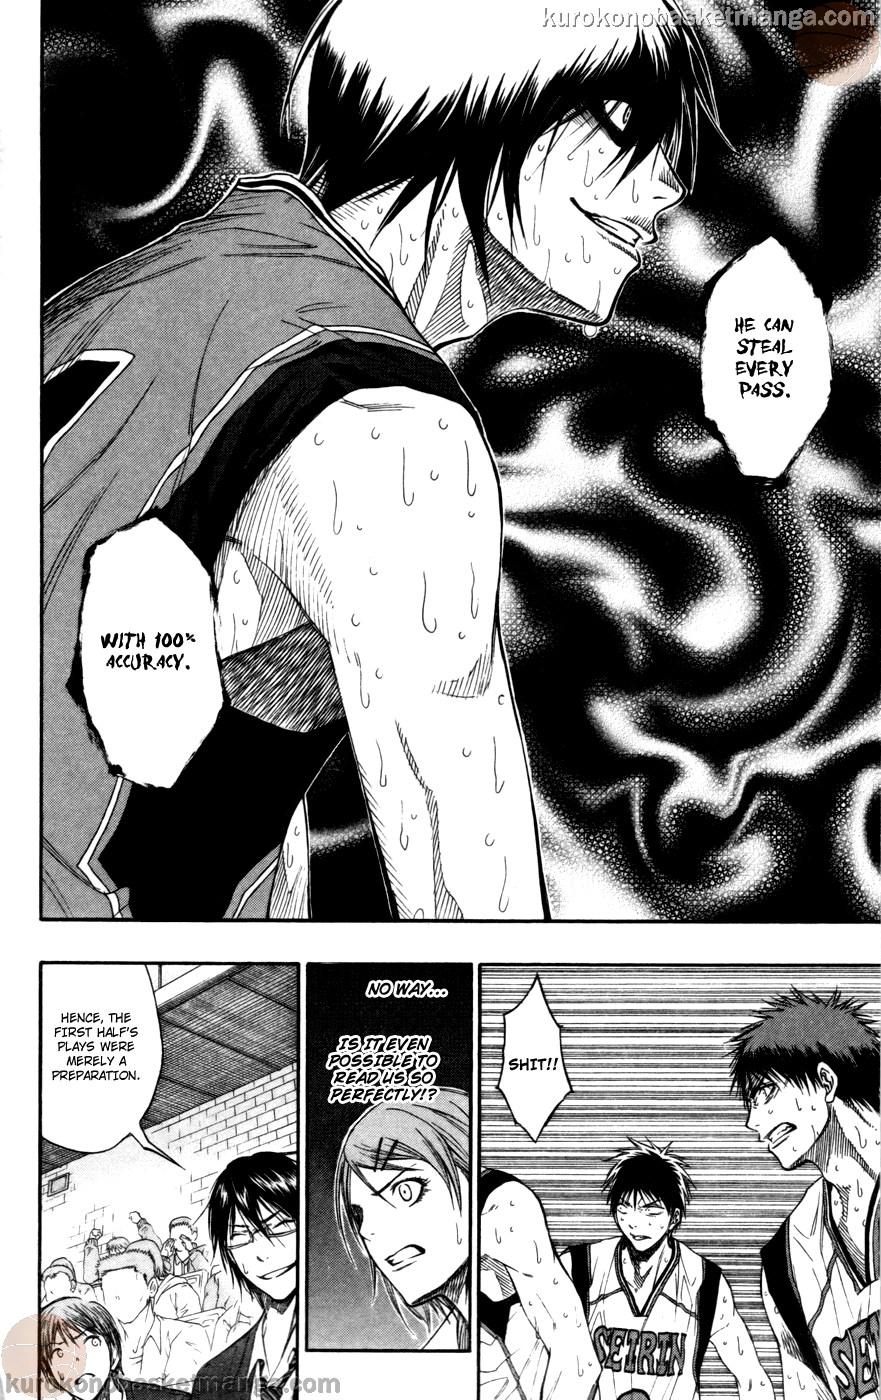 Kuroko no Basket Manga Chapter 104 - Image 16